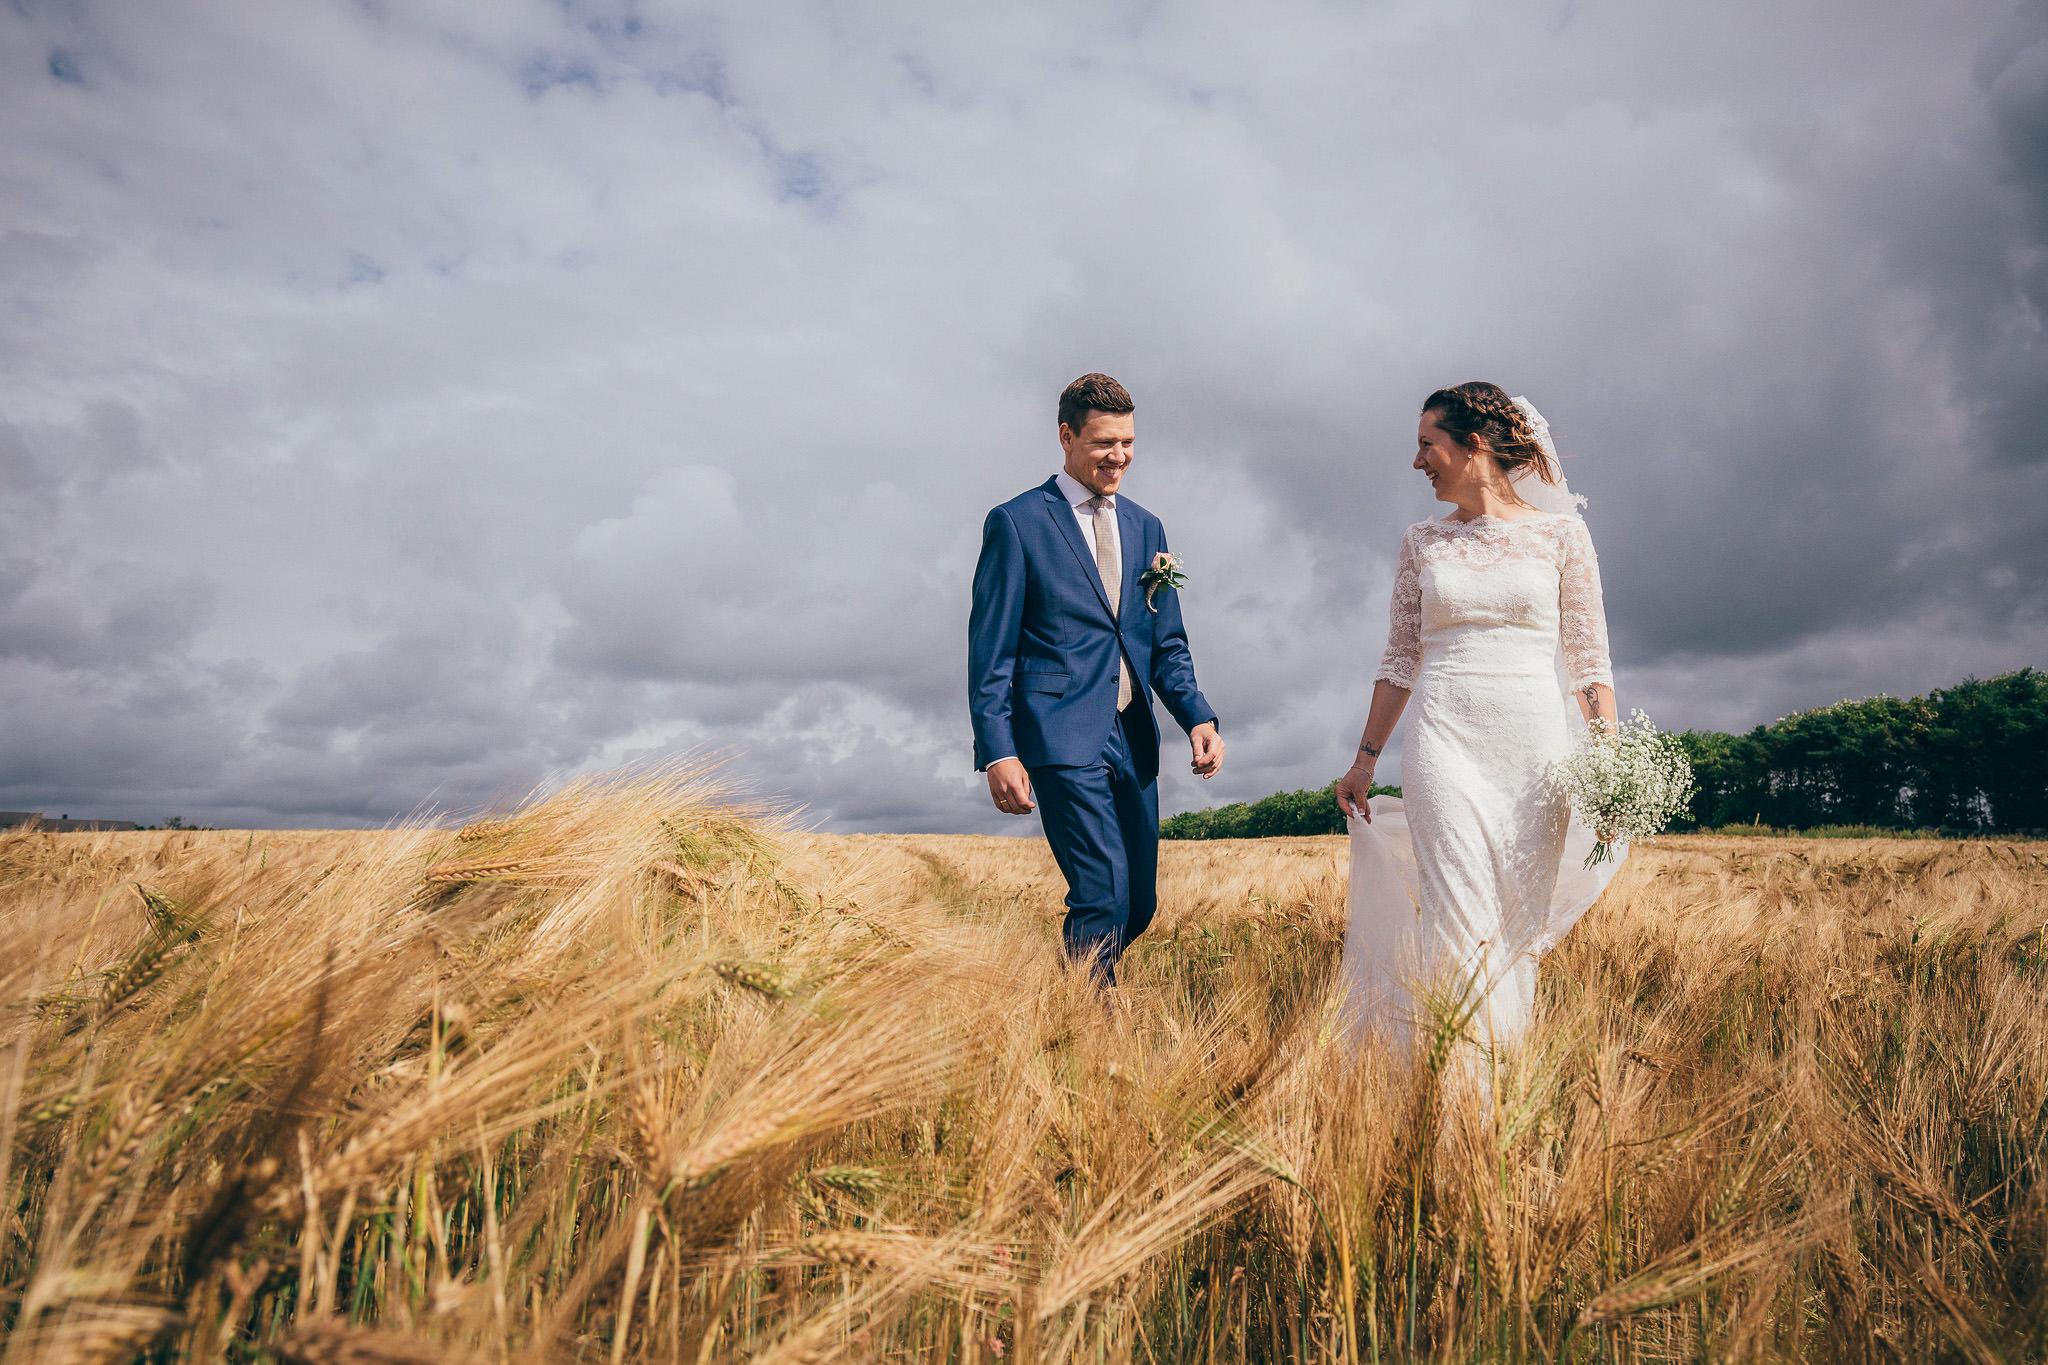 Norway+wedding+photographer+elopement+pre+wedding+Rogaland+bryllupsfotograf+Casey+Arneson-143.jpg